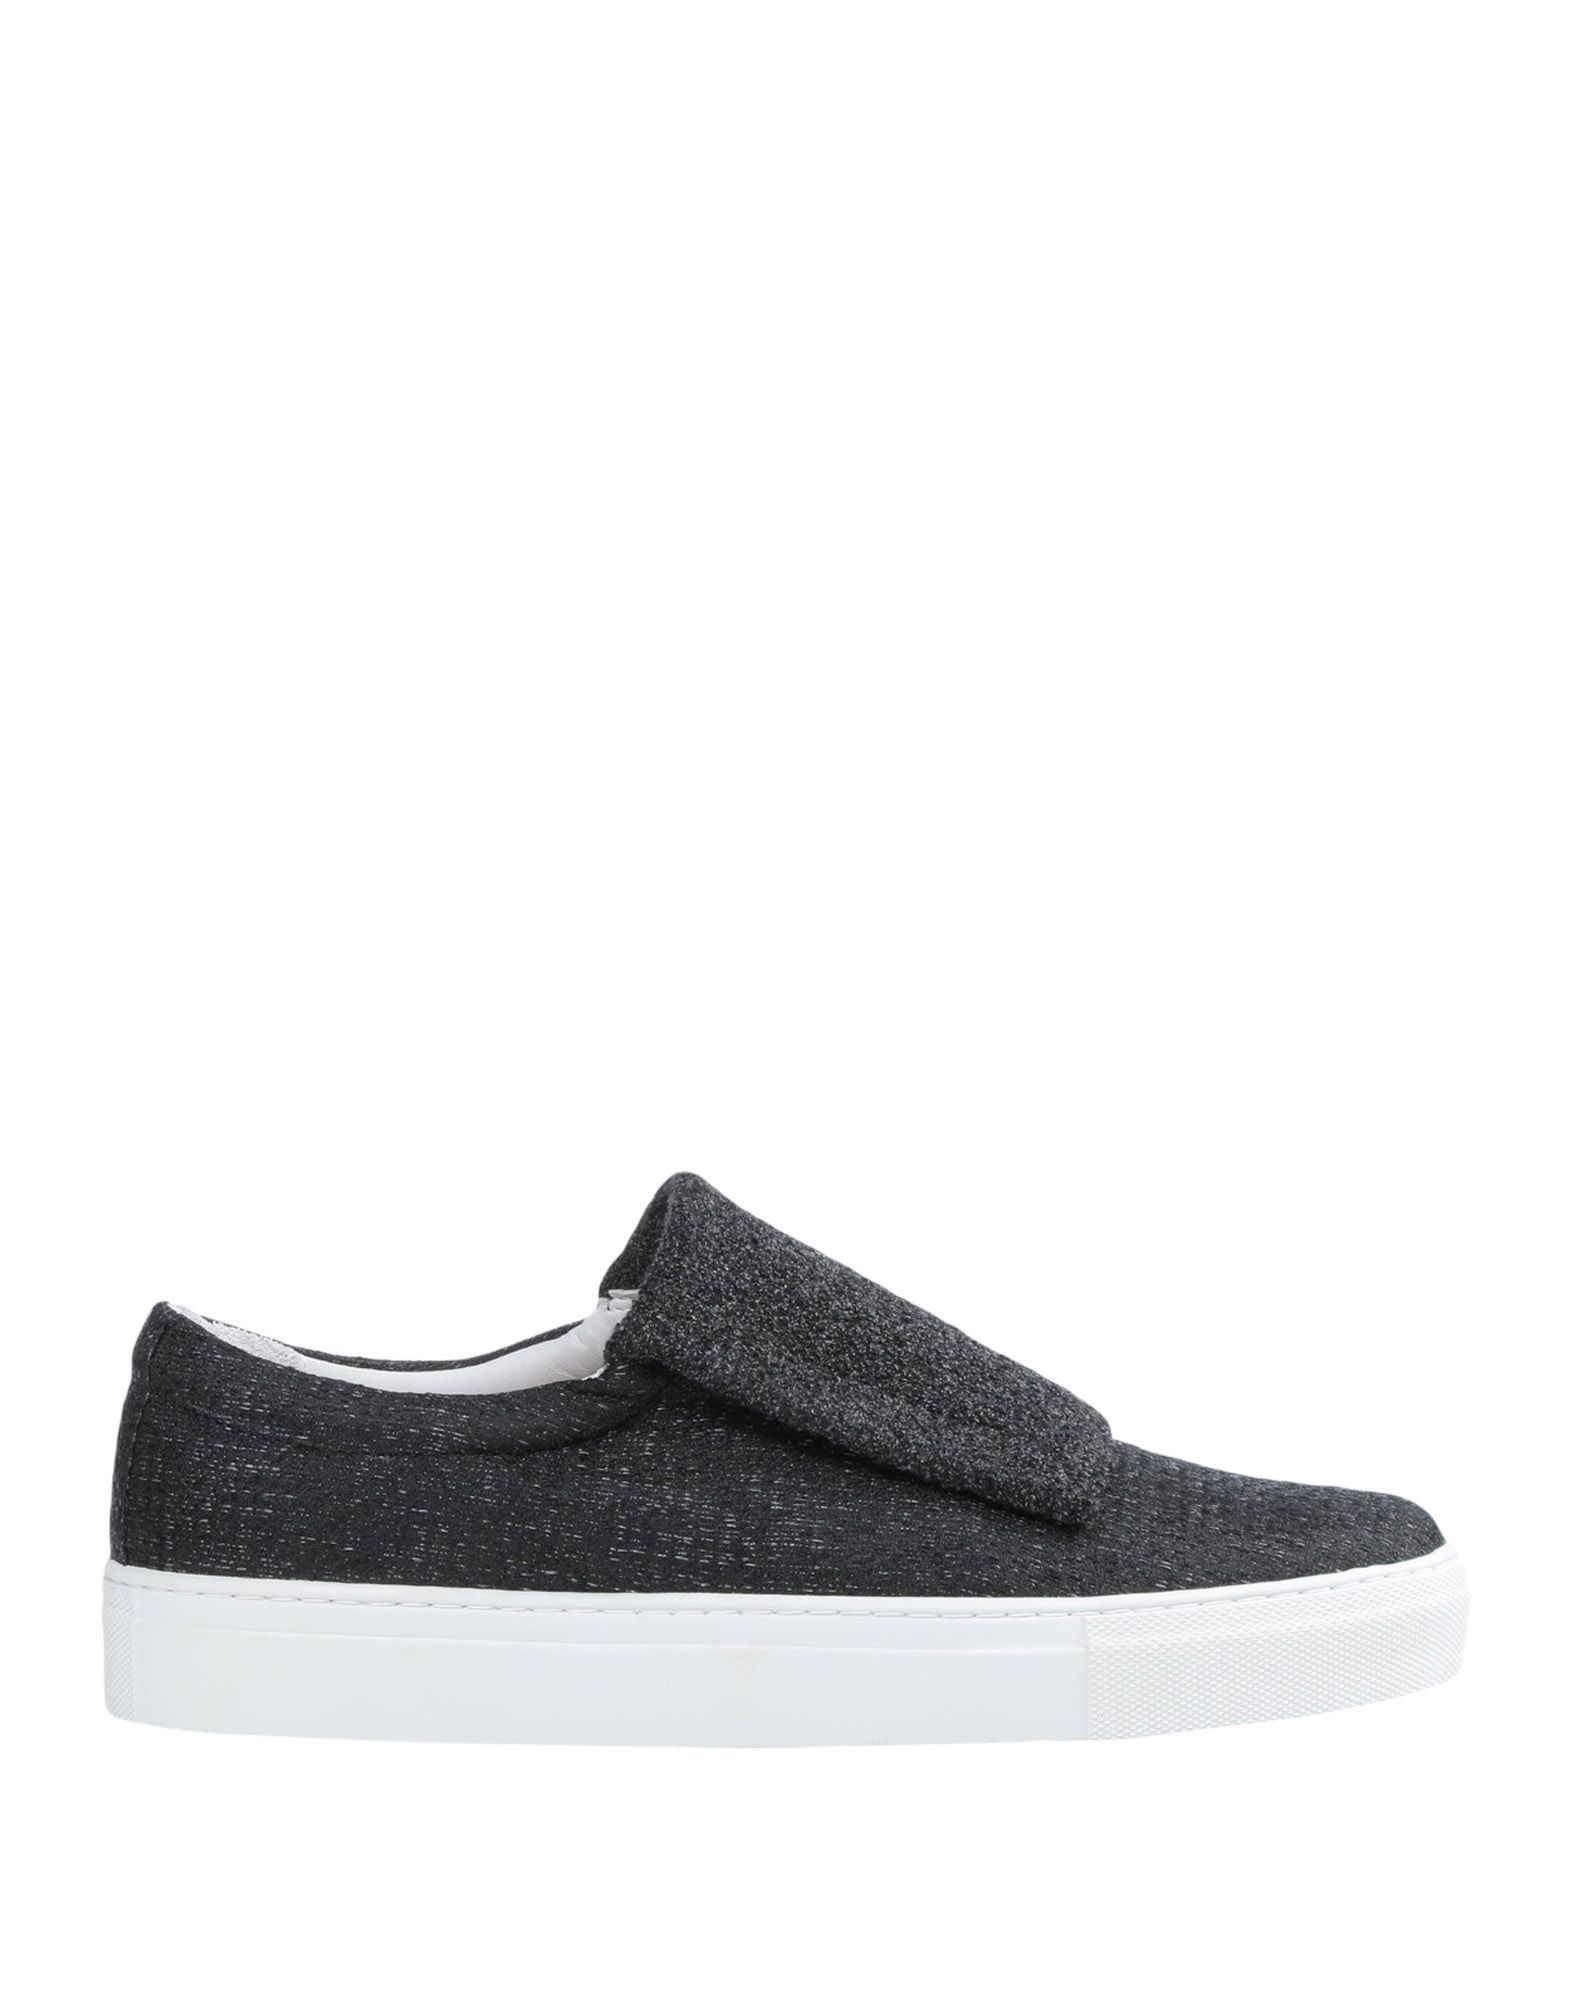 Primury Sneakers Gute Damen  11520668SM Gute Sneakers Qualität beliebte Schuhe 2194c0